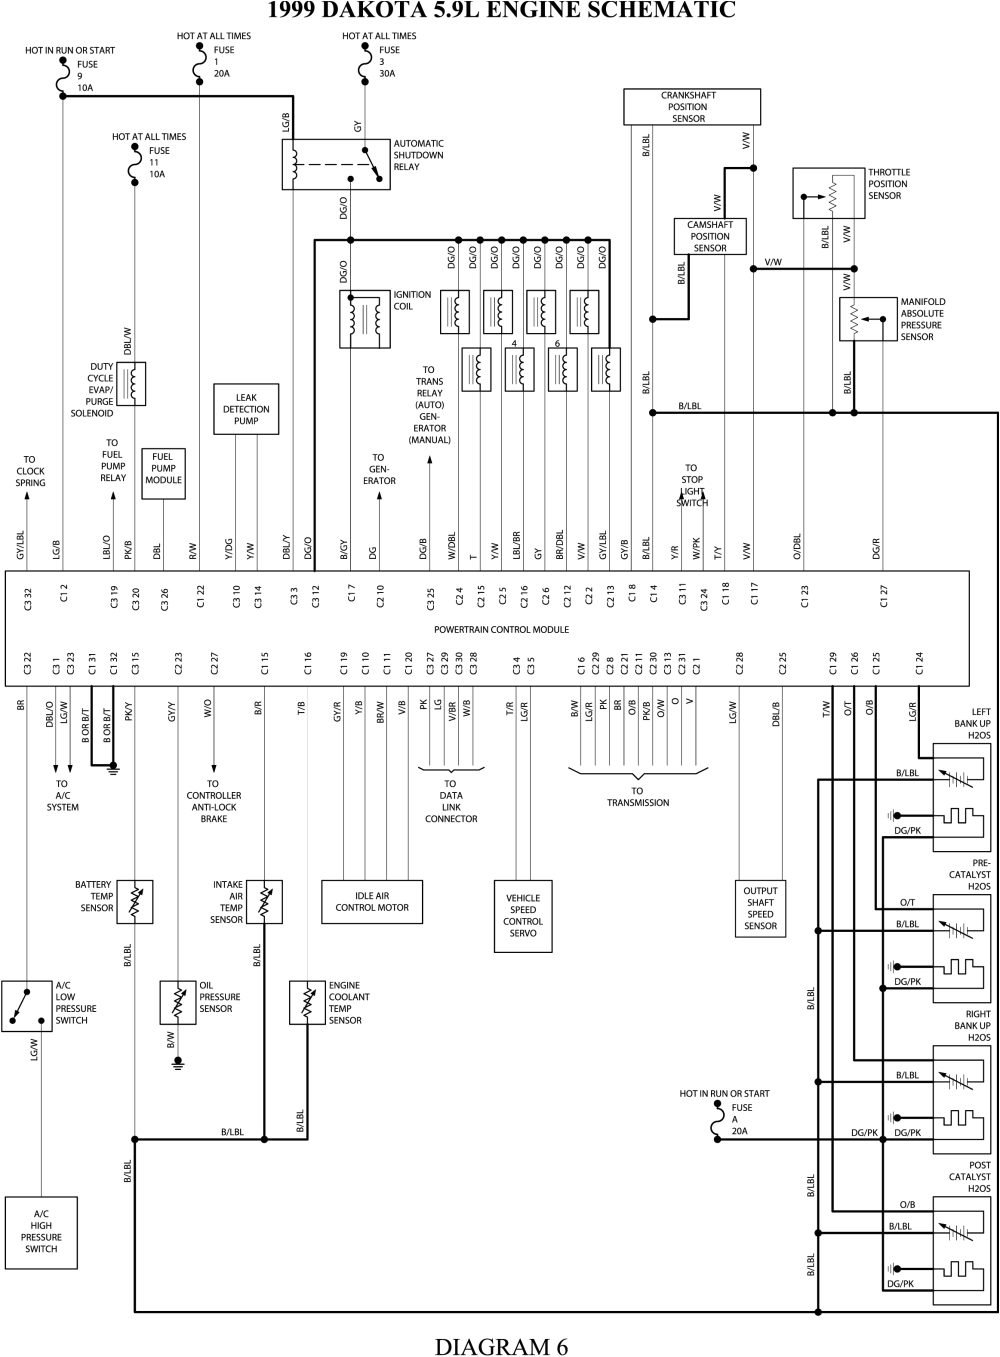 2011 dodge durango wiring diagram wiring diagram for you dodge durango alternator wiring diagram dodge durango alternator wiring diagram